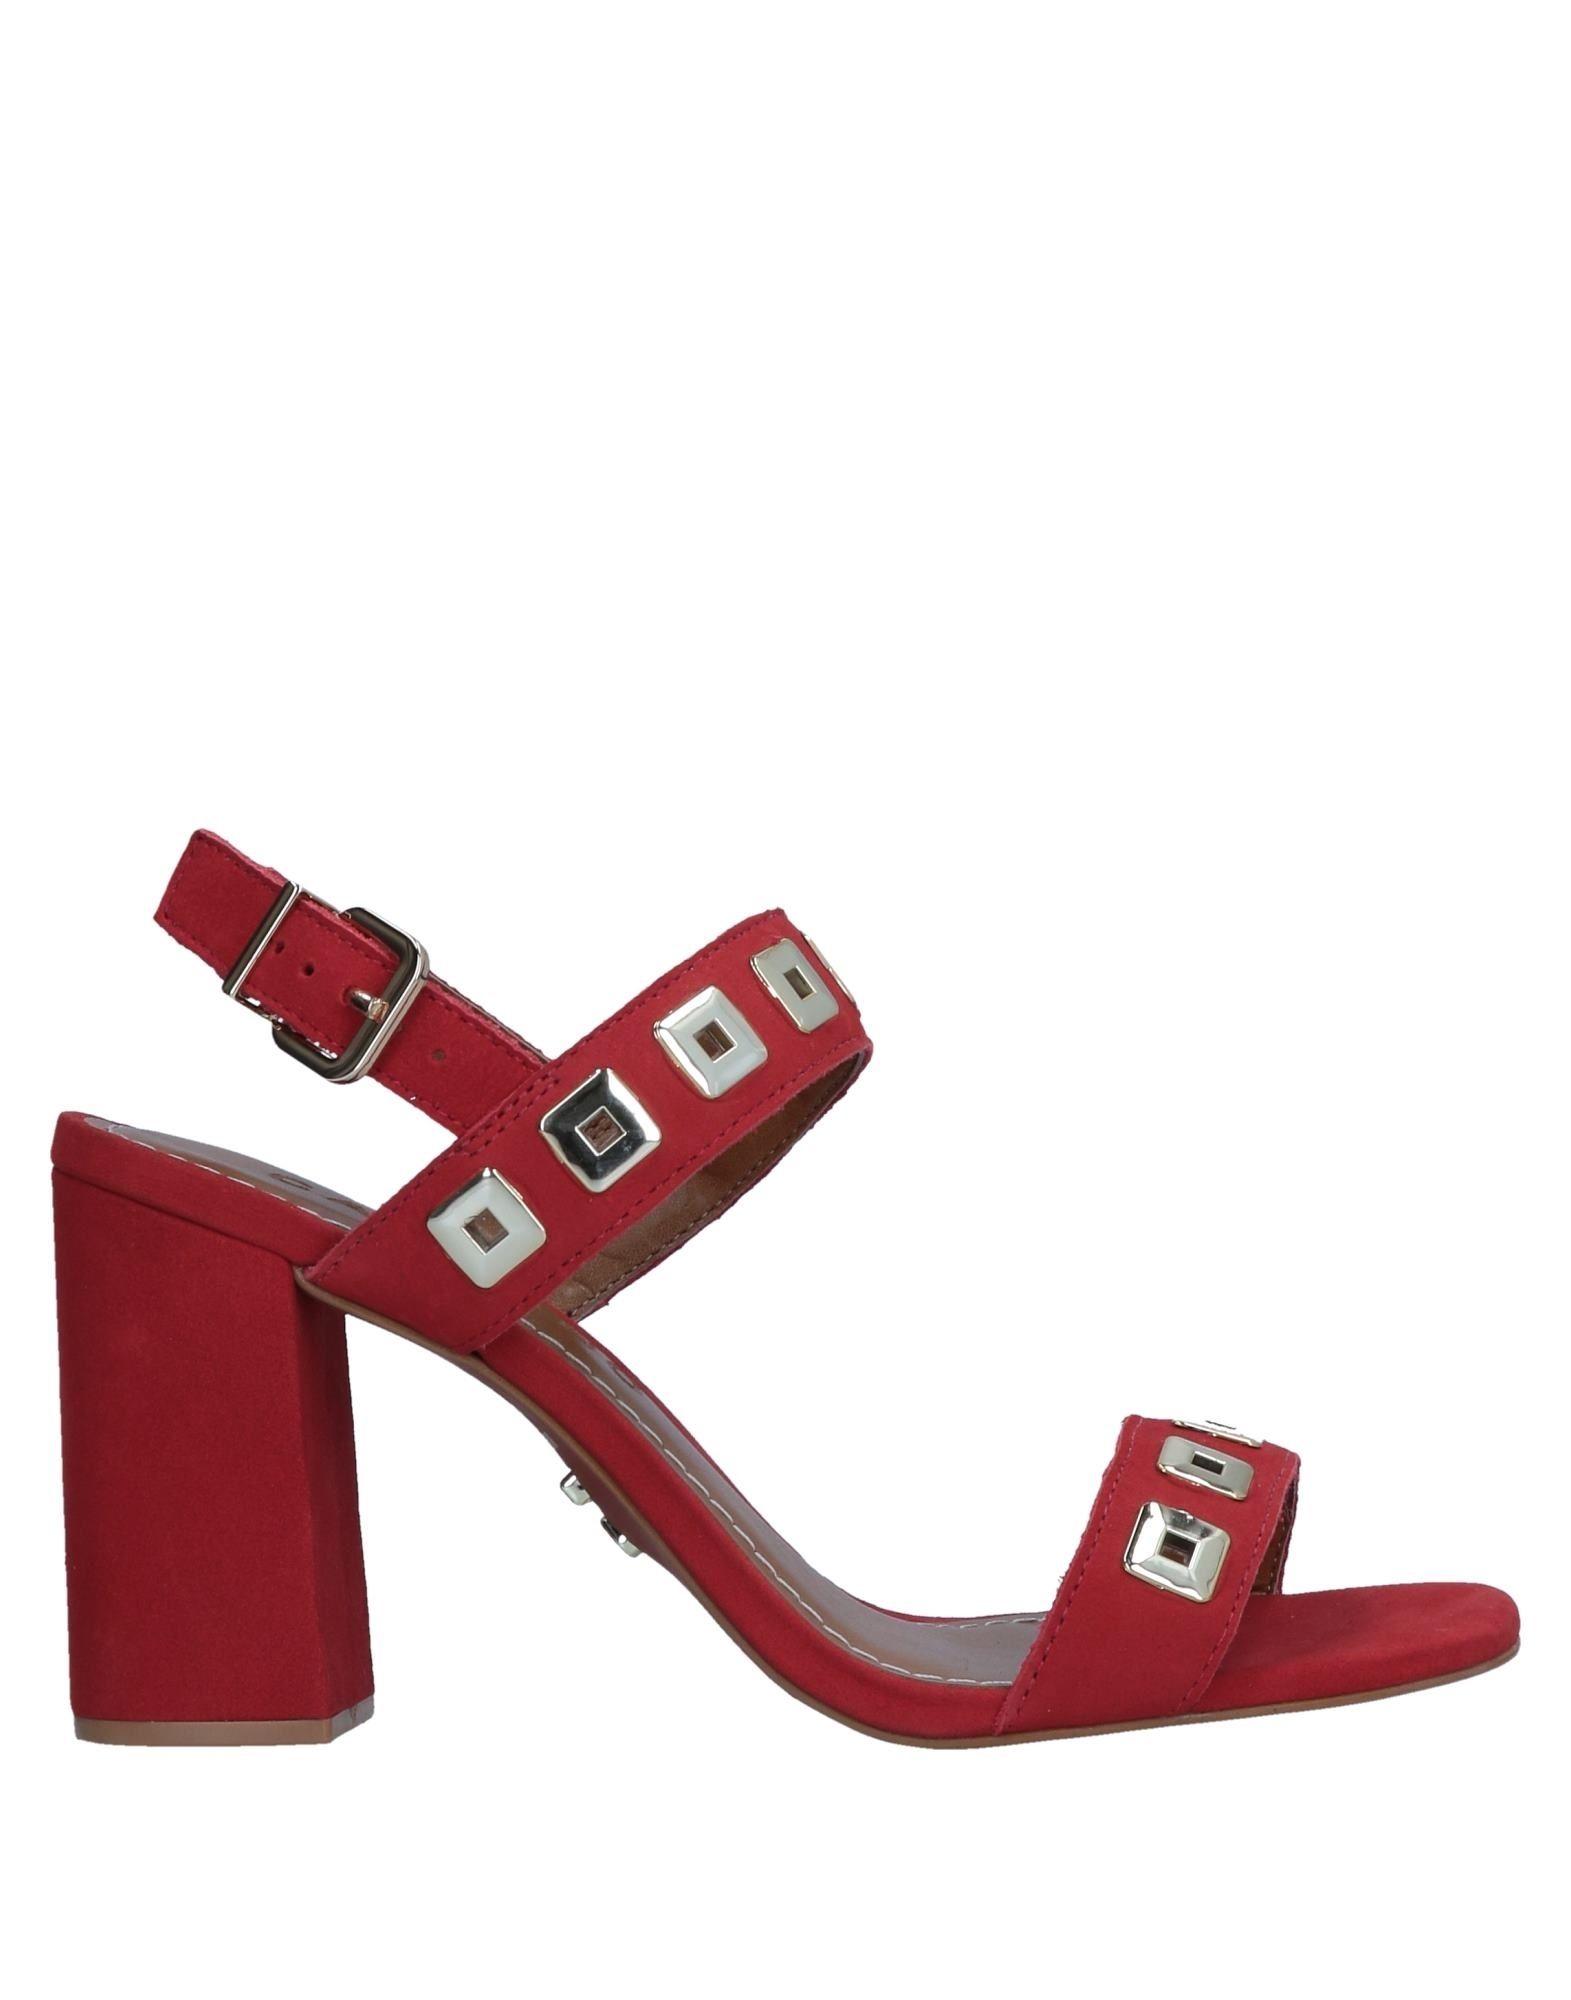 Carrano Sandalen Damen Qualität  11268641GE Gute Qualität Damen beliebte Schuhe 905411